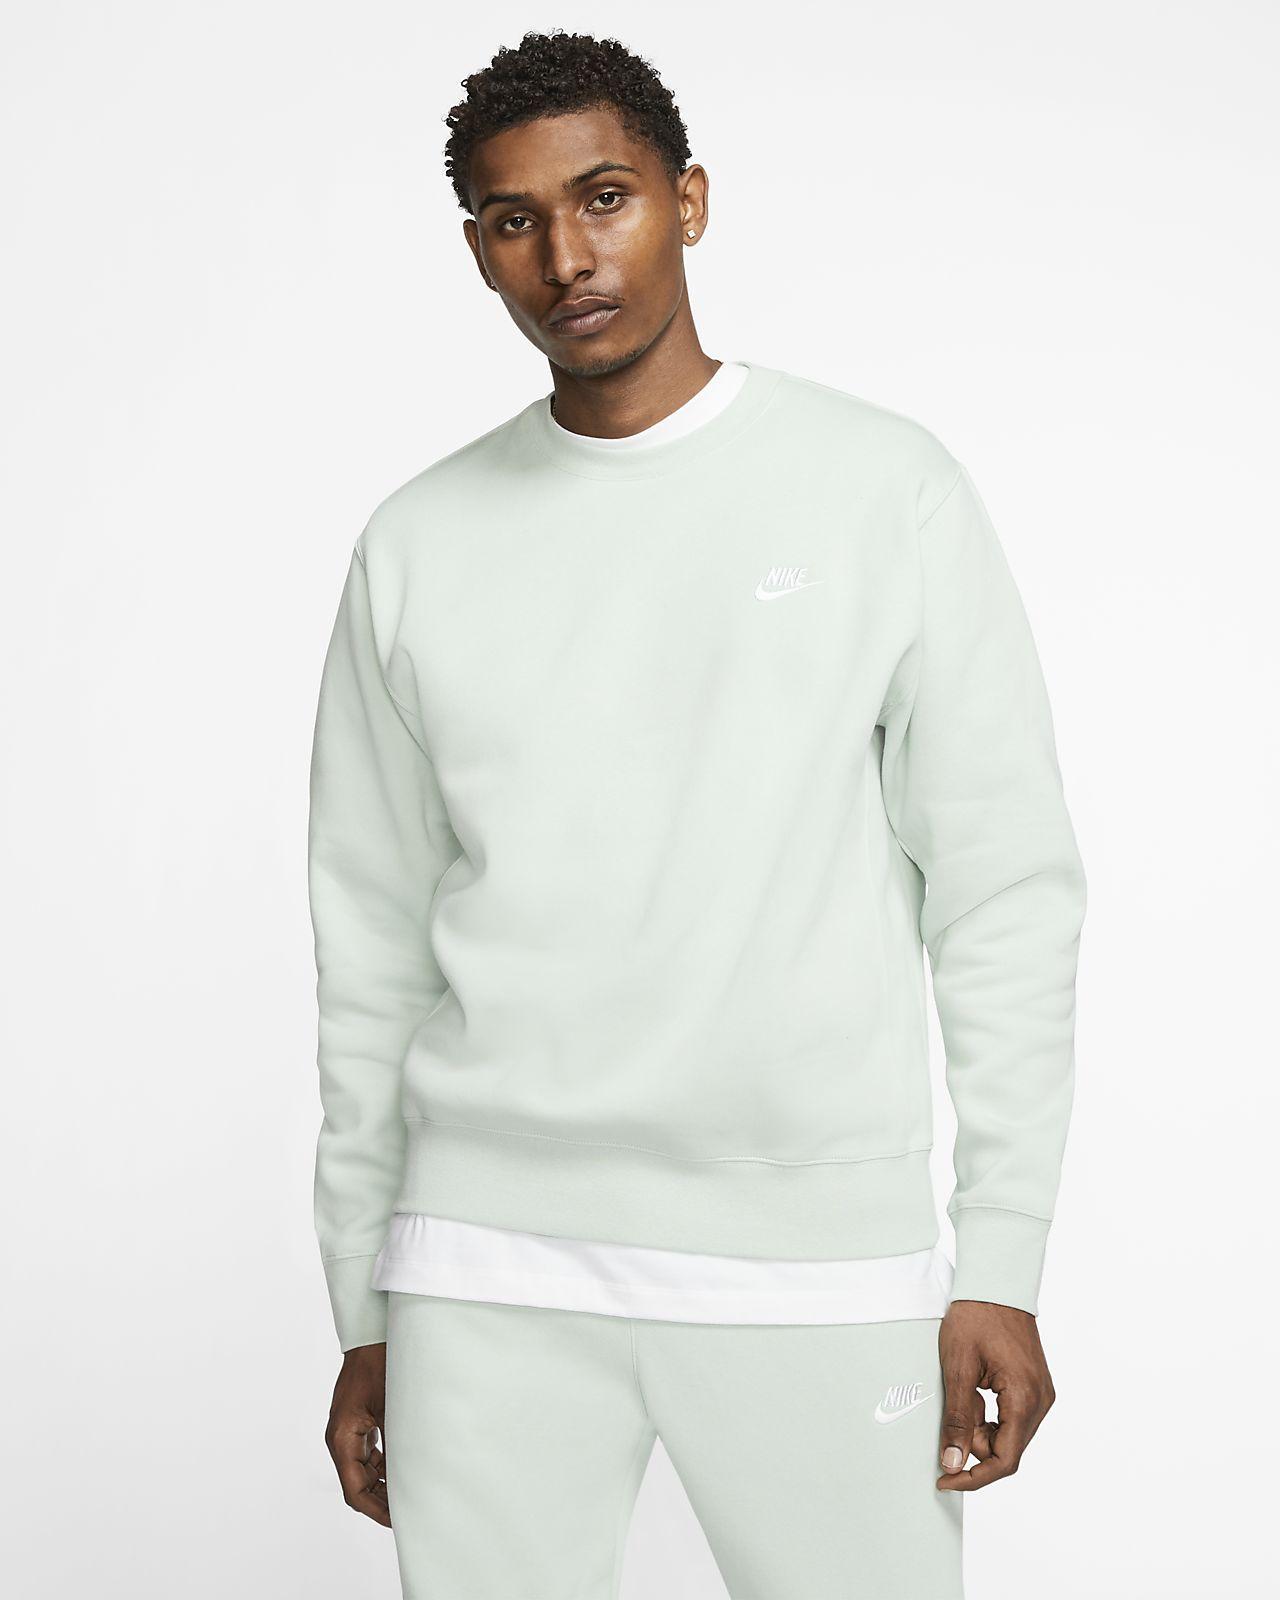 Nike Sportswear Club Fleece Crew Nike Com Ropa Nike [ 1600 x 1280 Pixel ]